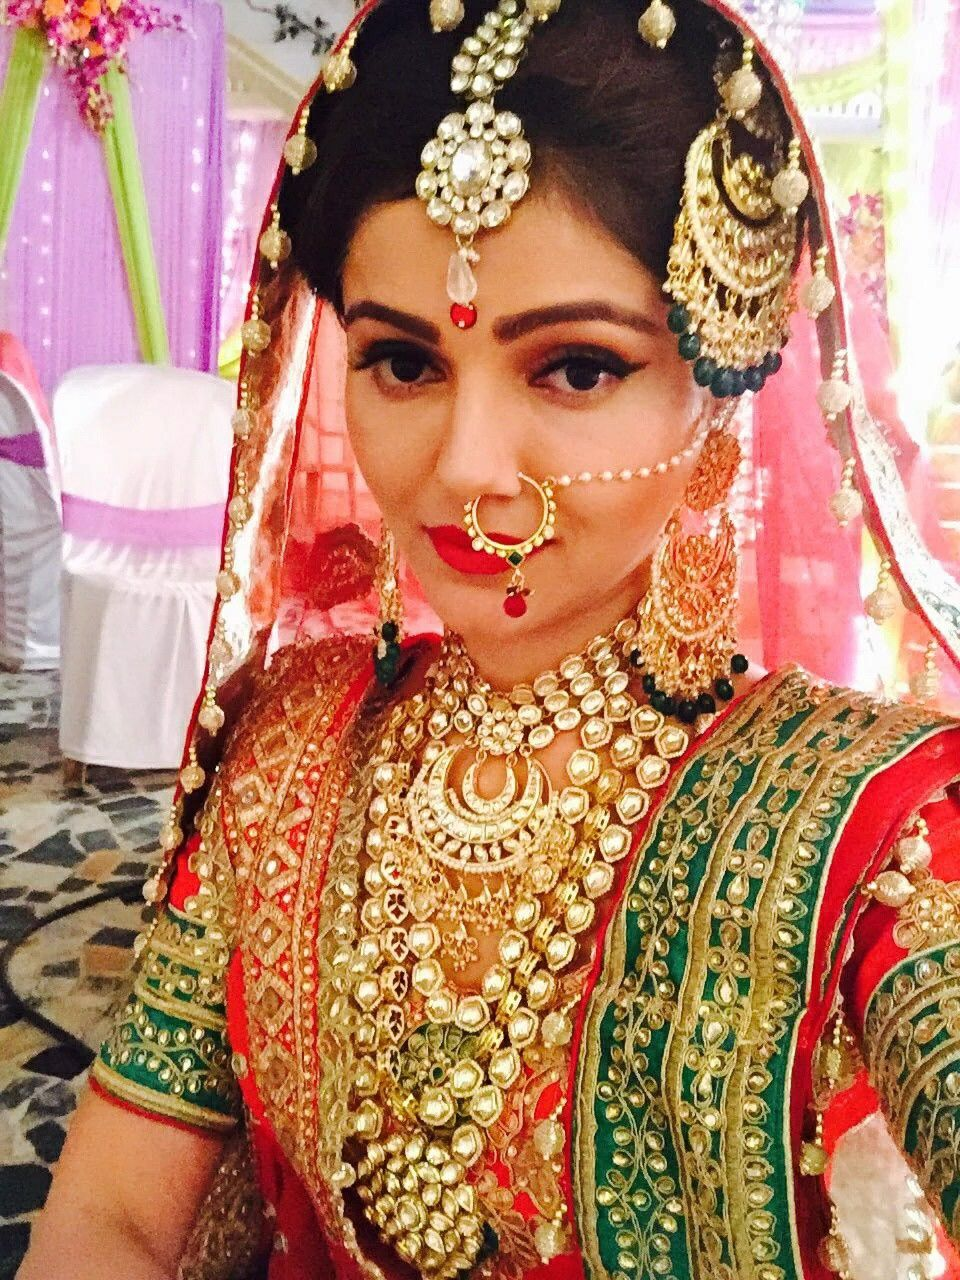 Rubina dilaik | IndianTV celeb | Indian bridal fashion